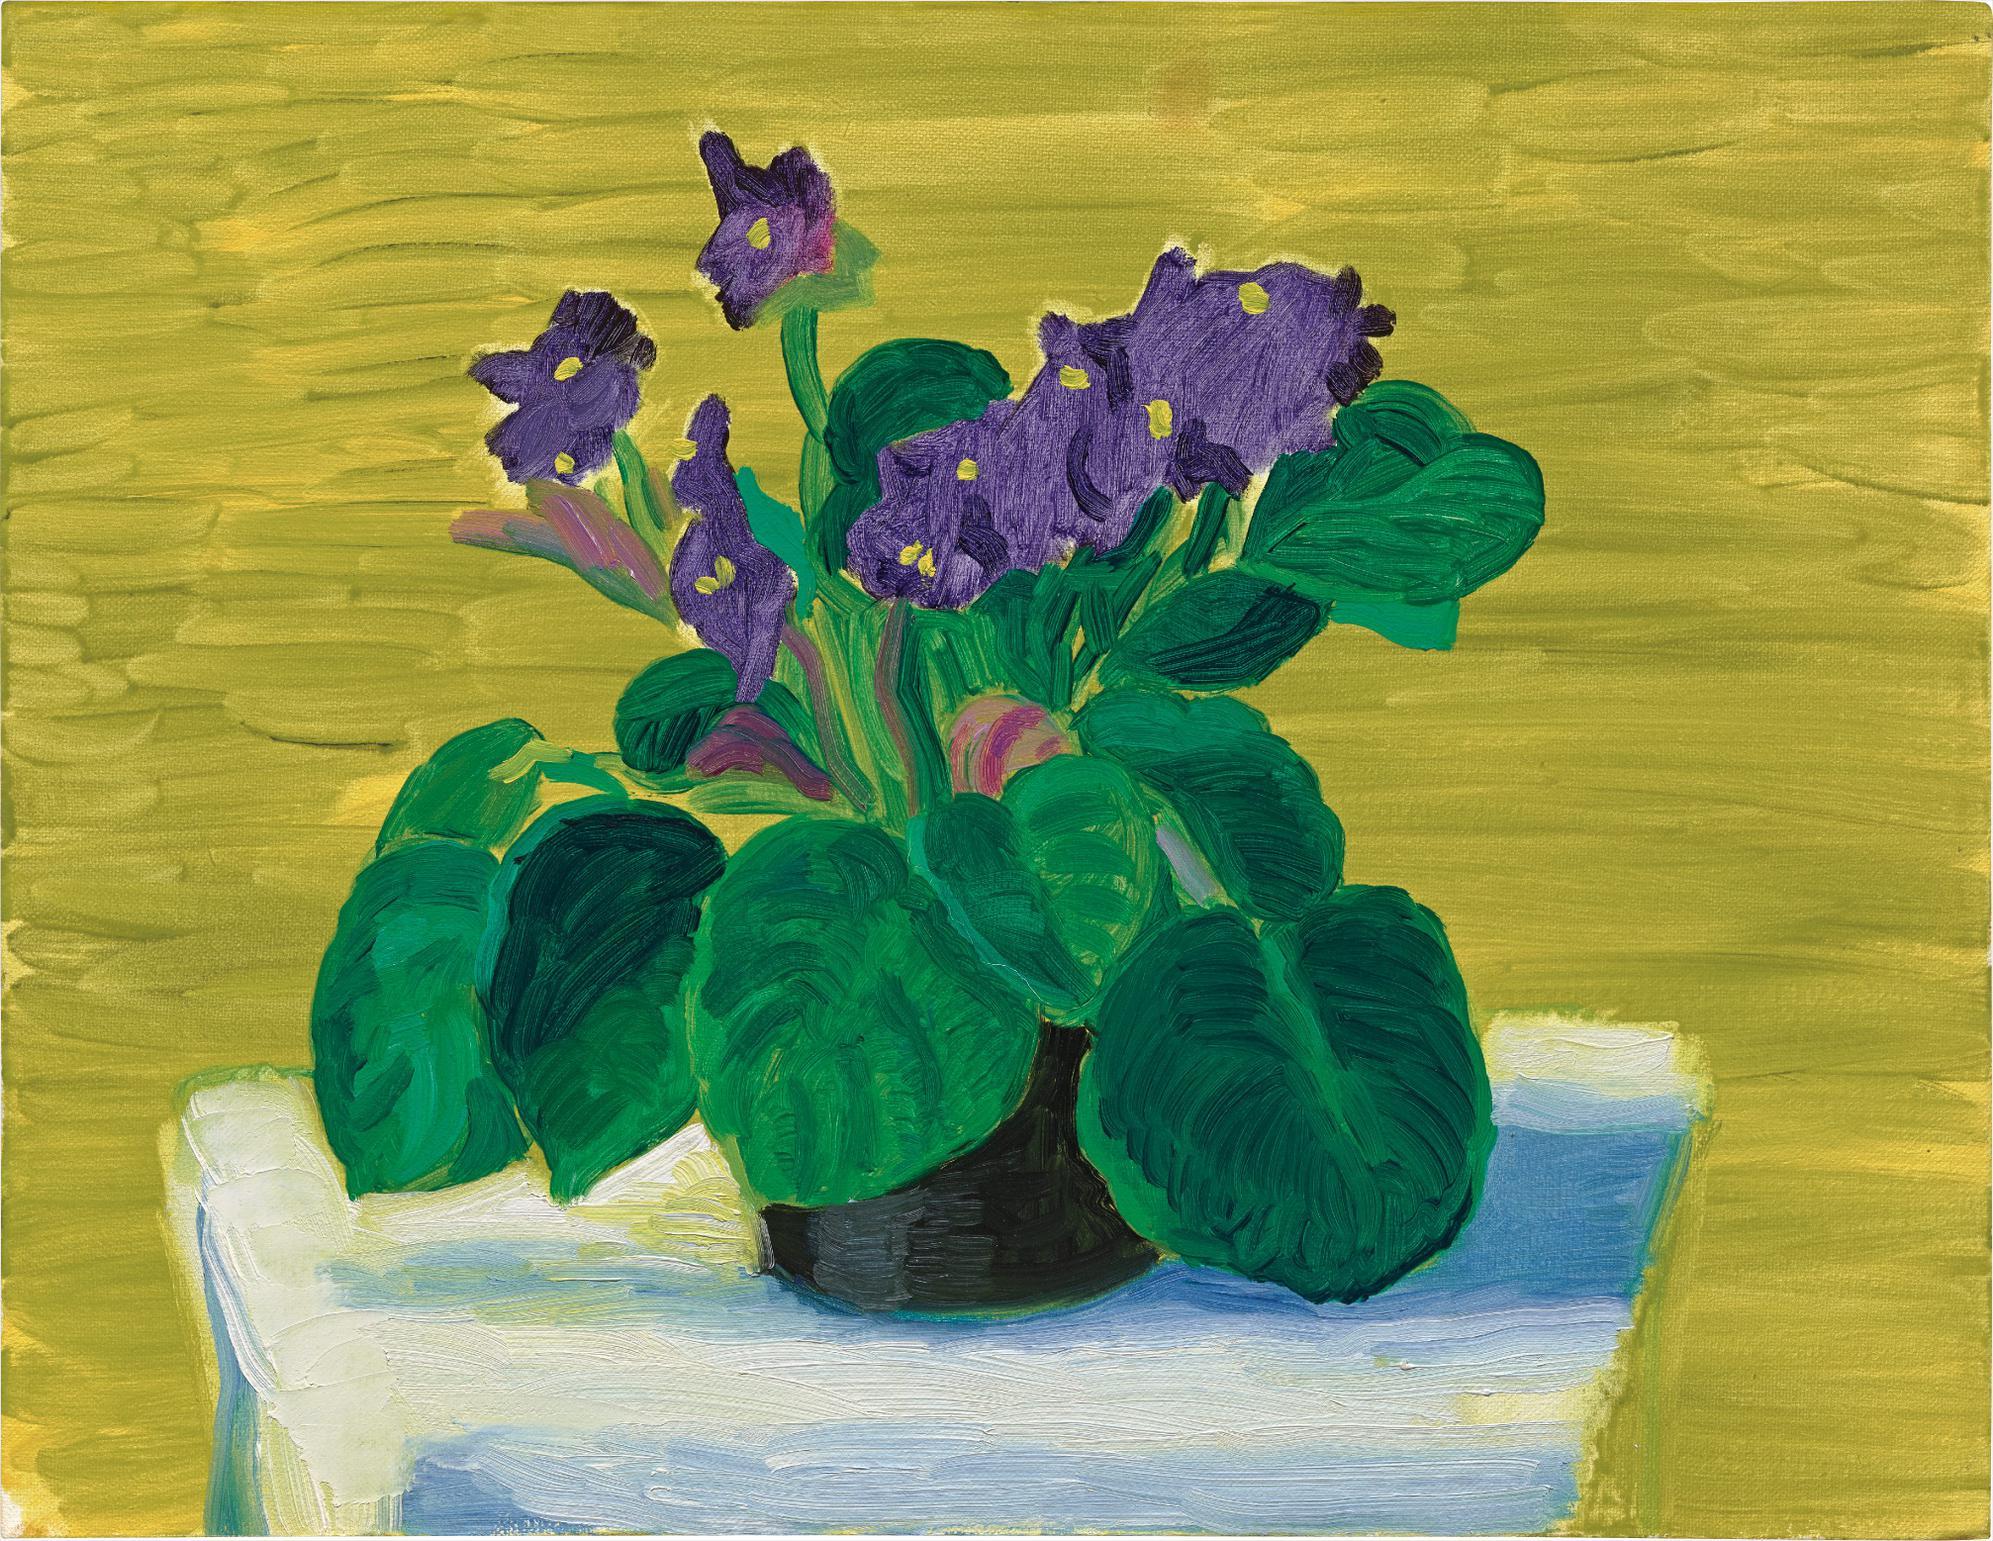 David Hockney-Bridlington Violets-1989